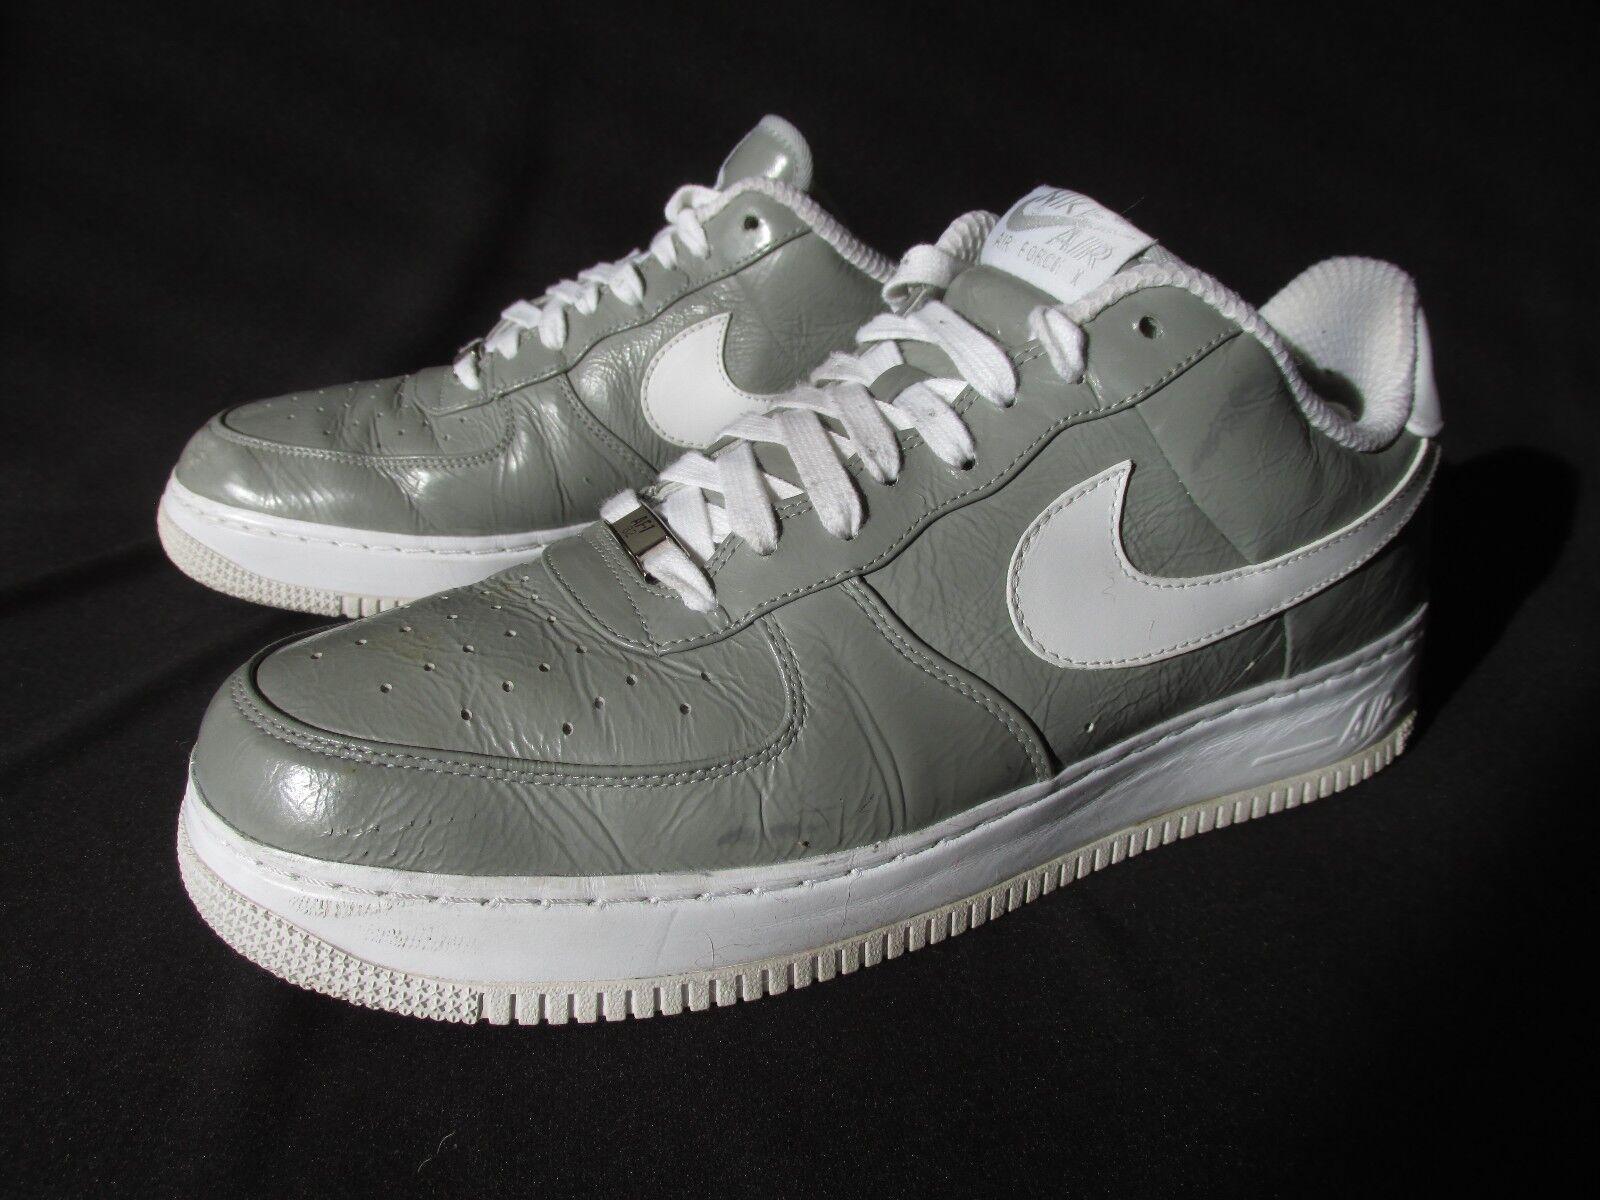 Nike 2008 air force lo slam jam di pelle grigia basso 310931-012 uomini '12 eu46